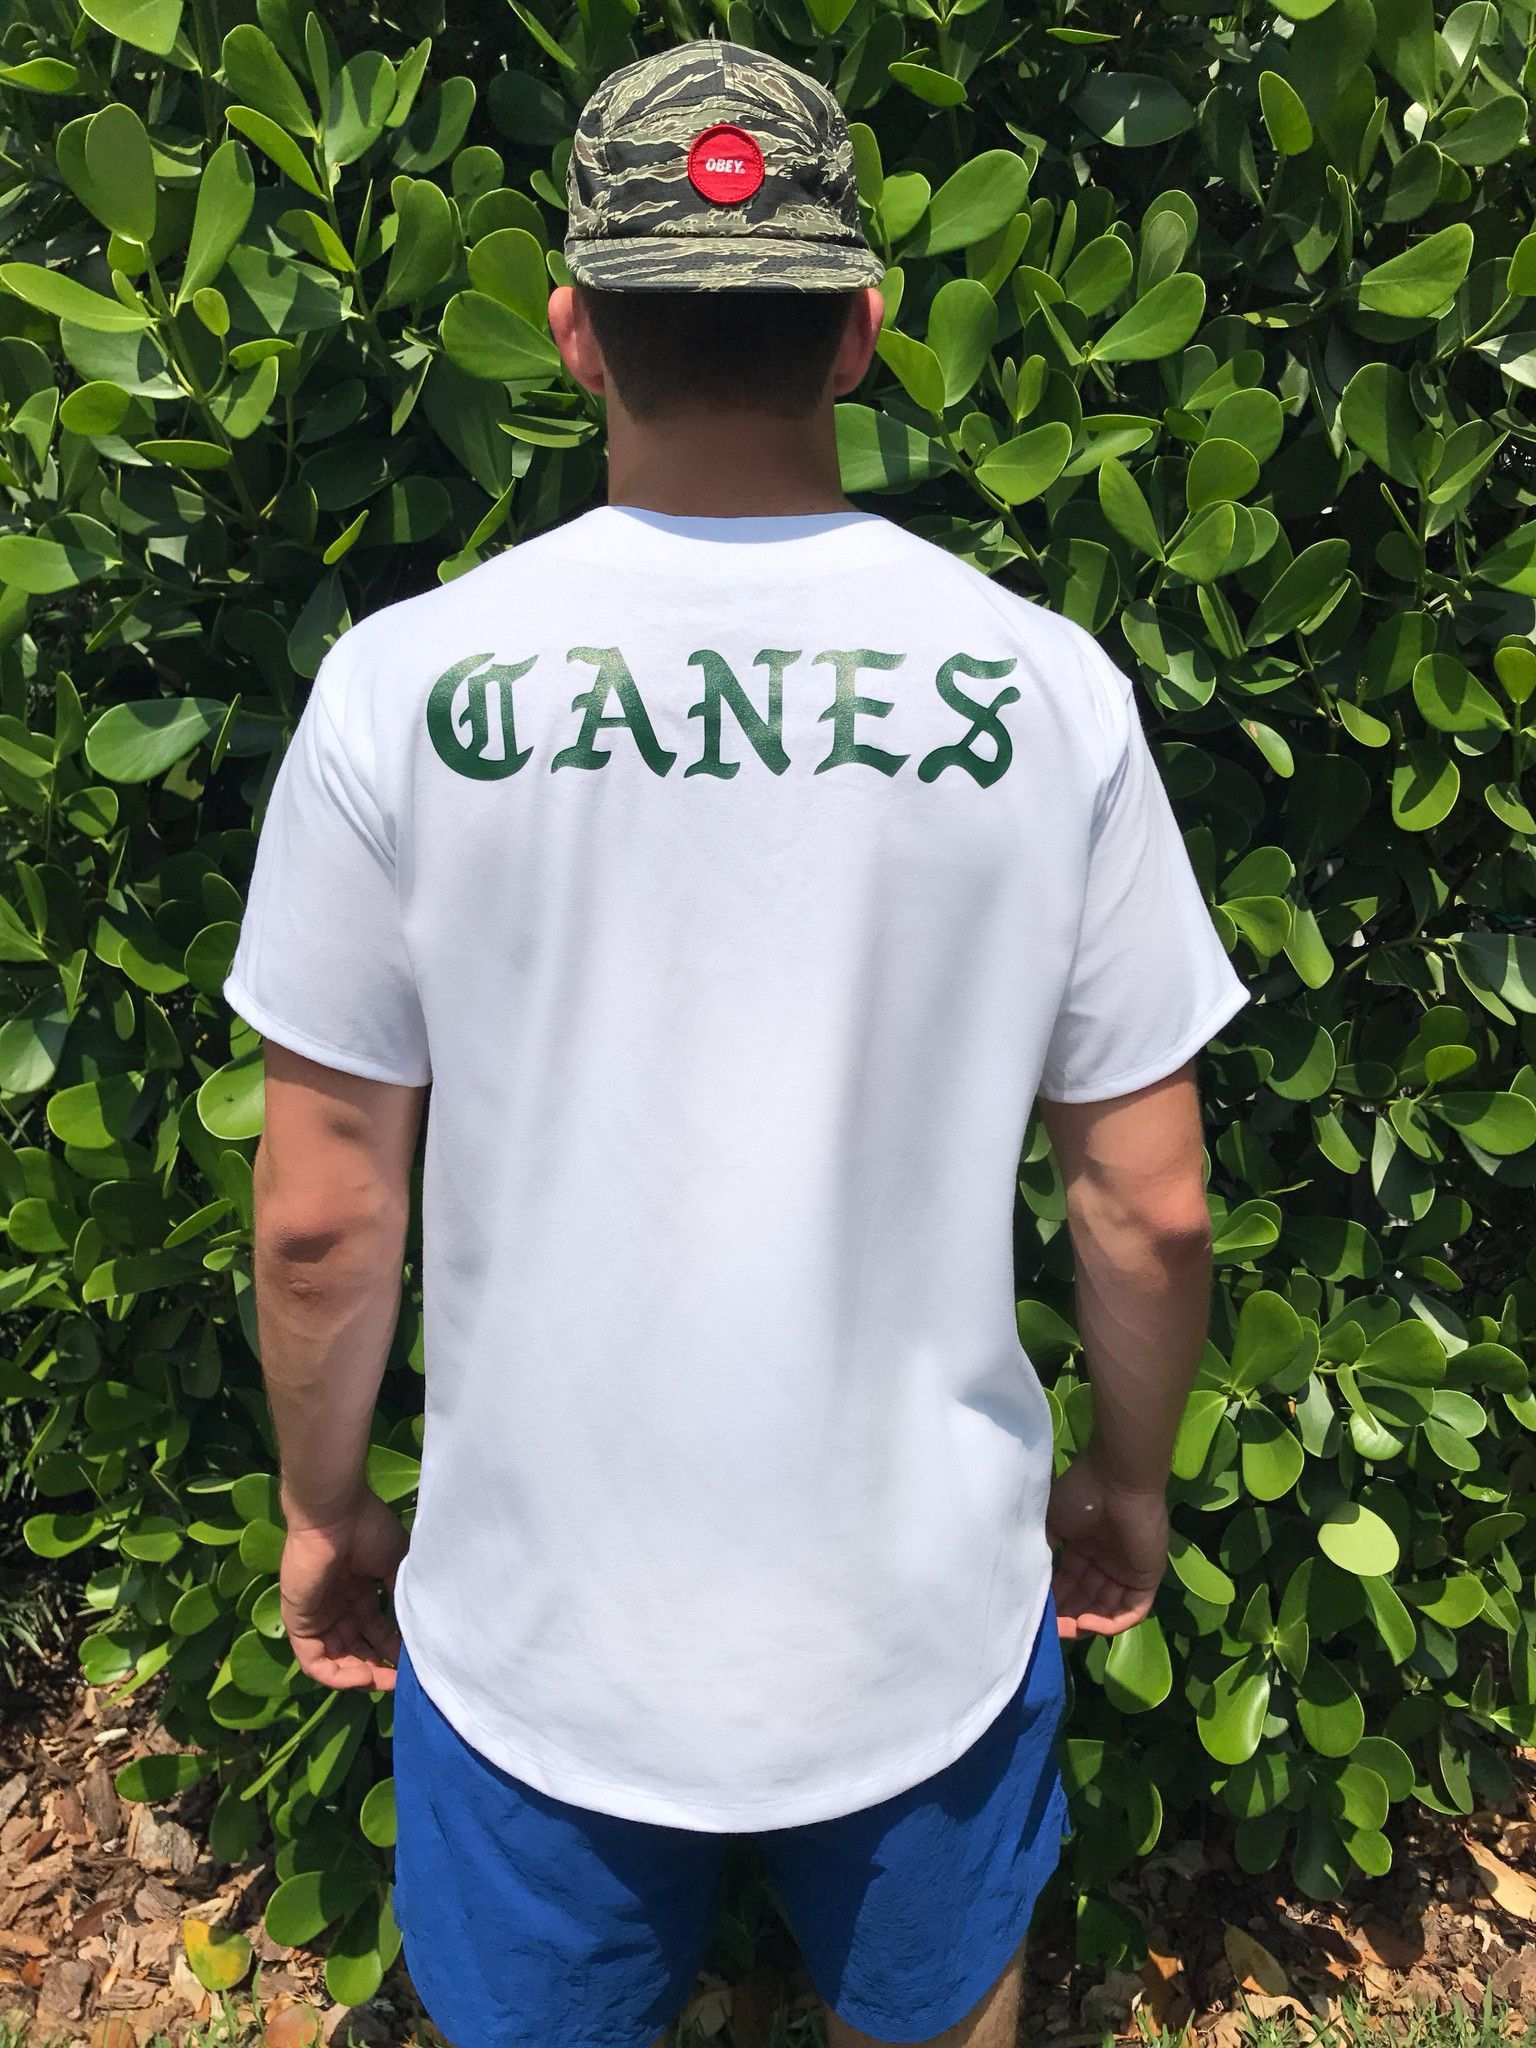 Design your own t-shirt miami - Miami Canes Baseball Jersey